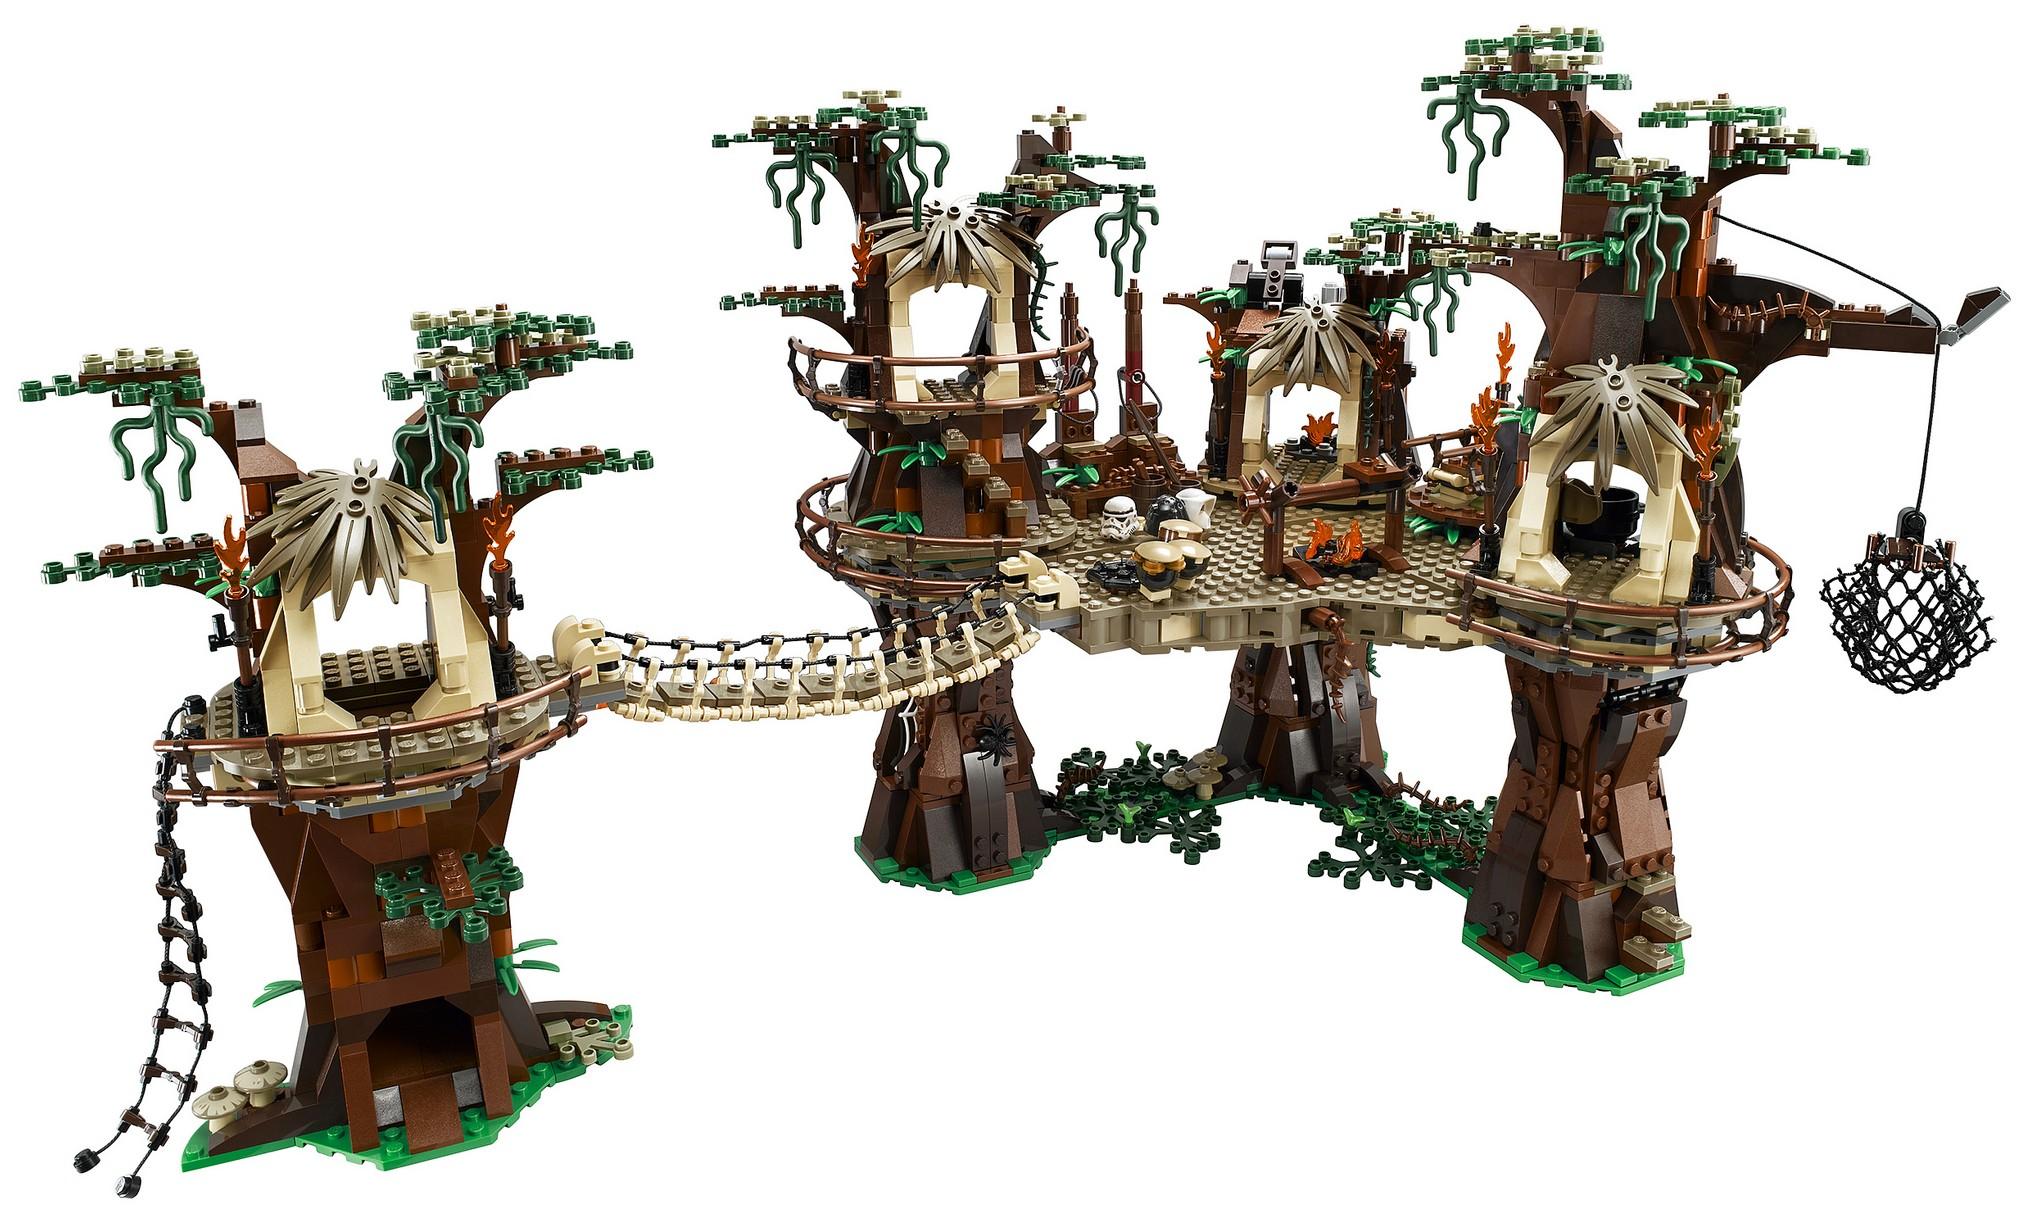 lego star wars ewok village 10236 fully revealed w video photos bricks and bloks. Black Bedroom Furniture Sets. Home Design Ideas